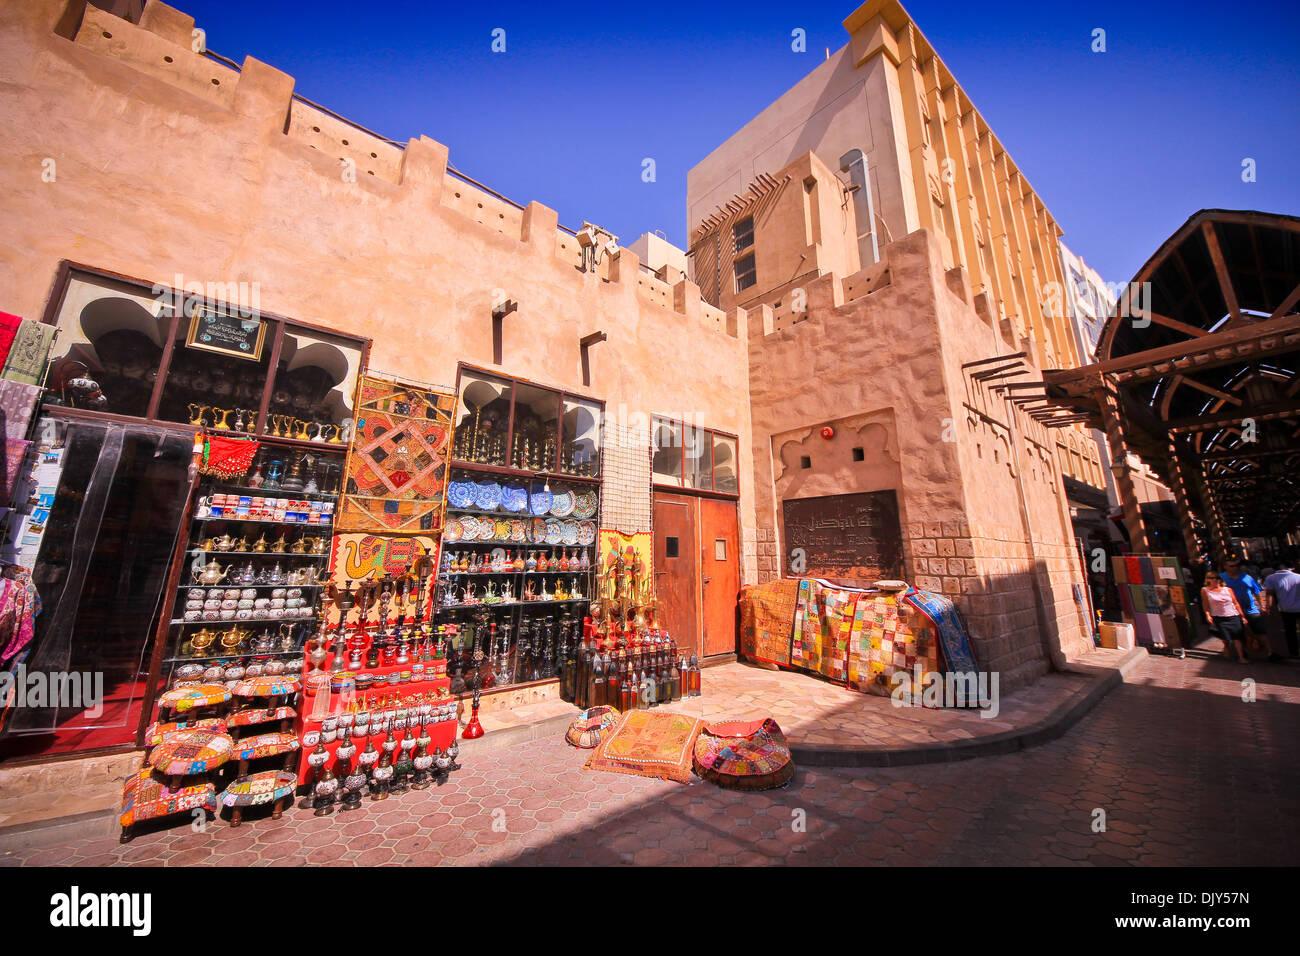 Bur Dubai Souk, Dubai, United Arab Emirates. - Stock Image